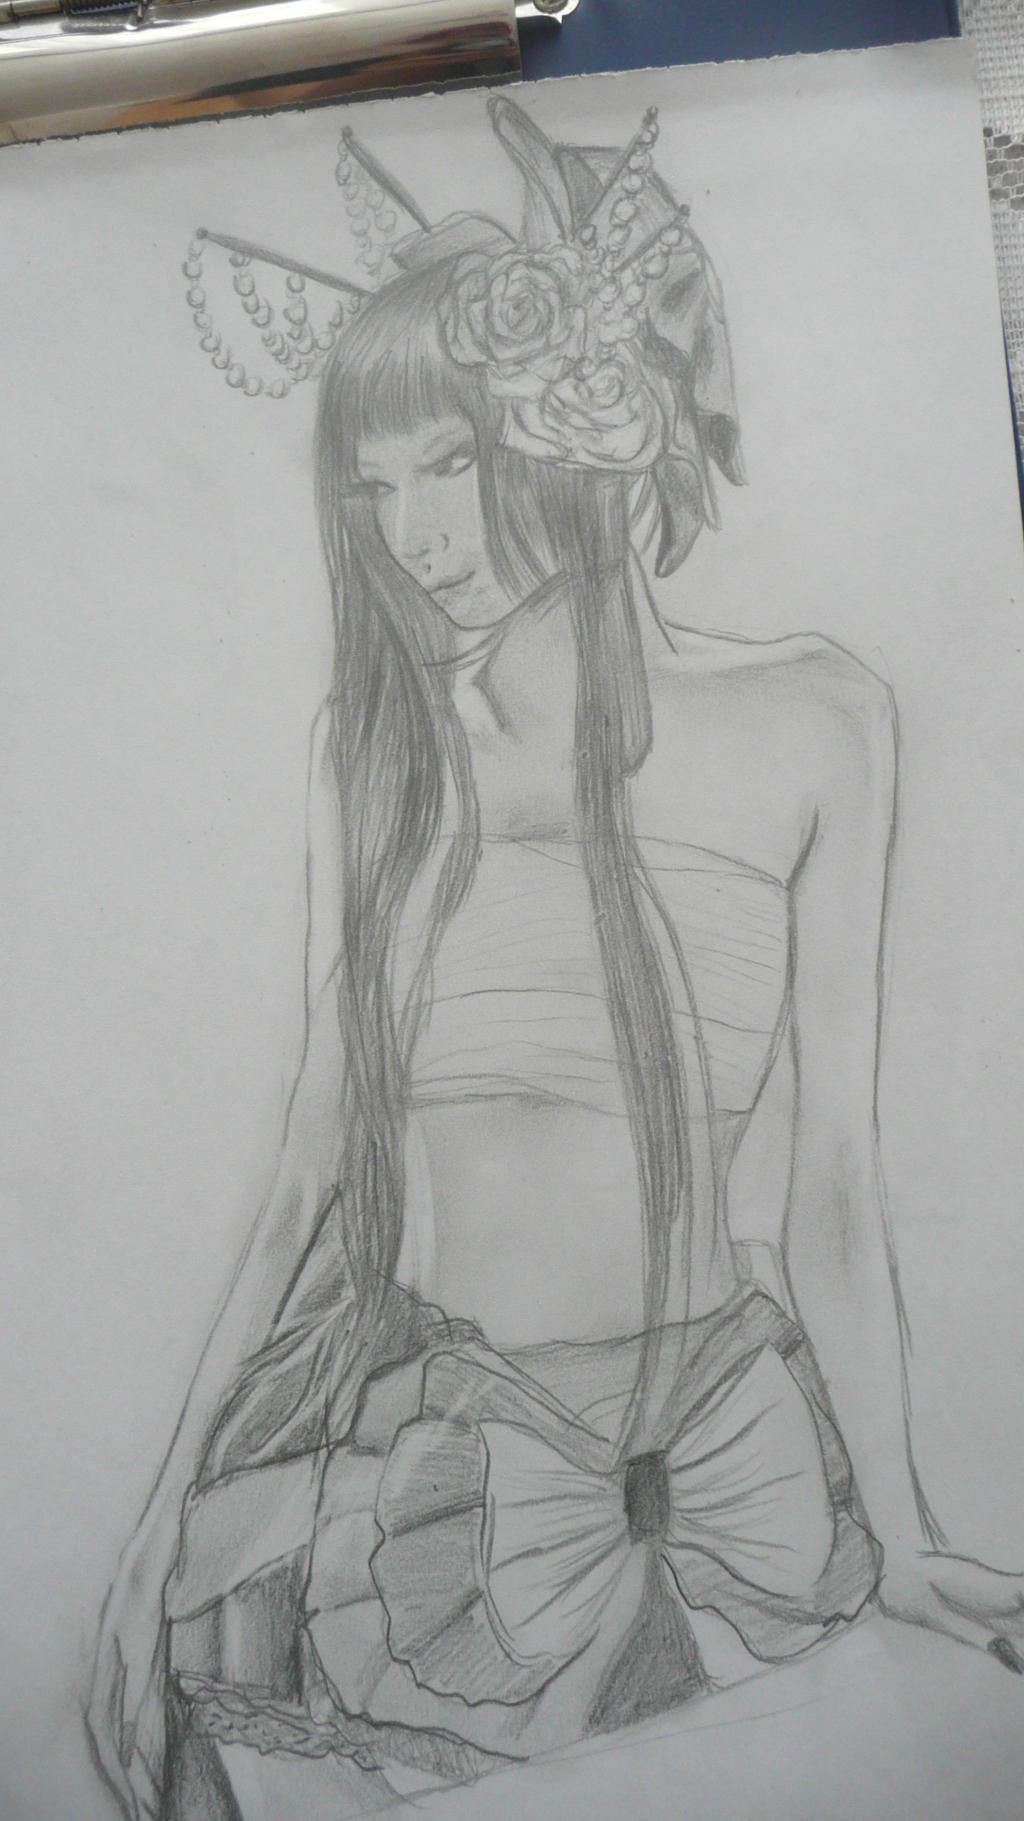 Modern Geisha (Better Quality) by rokusanchan